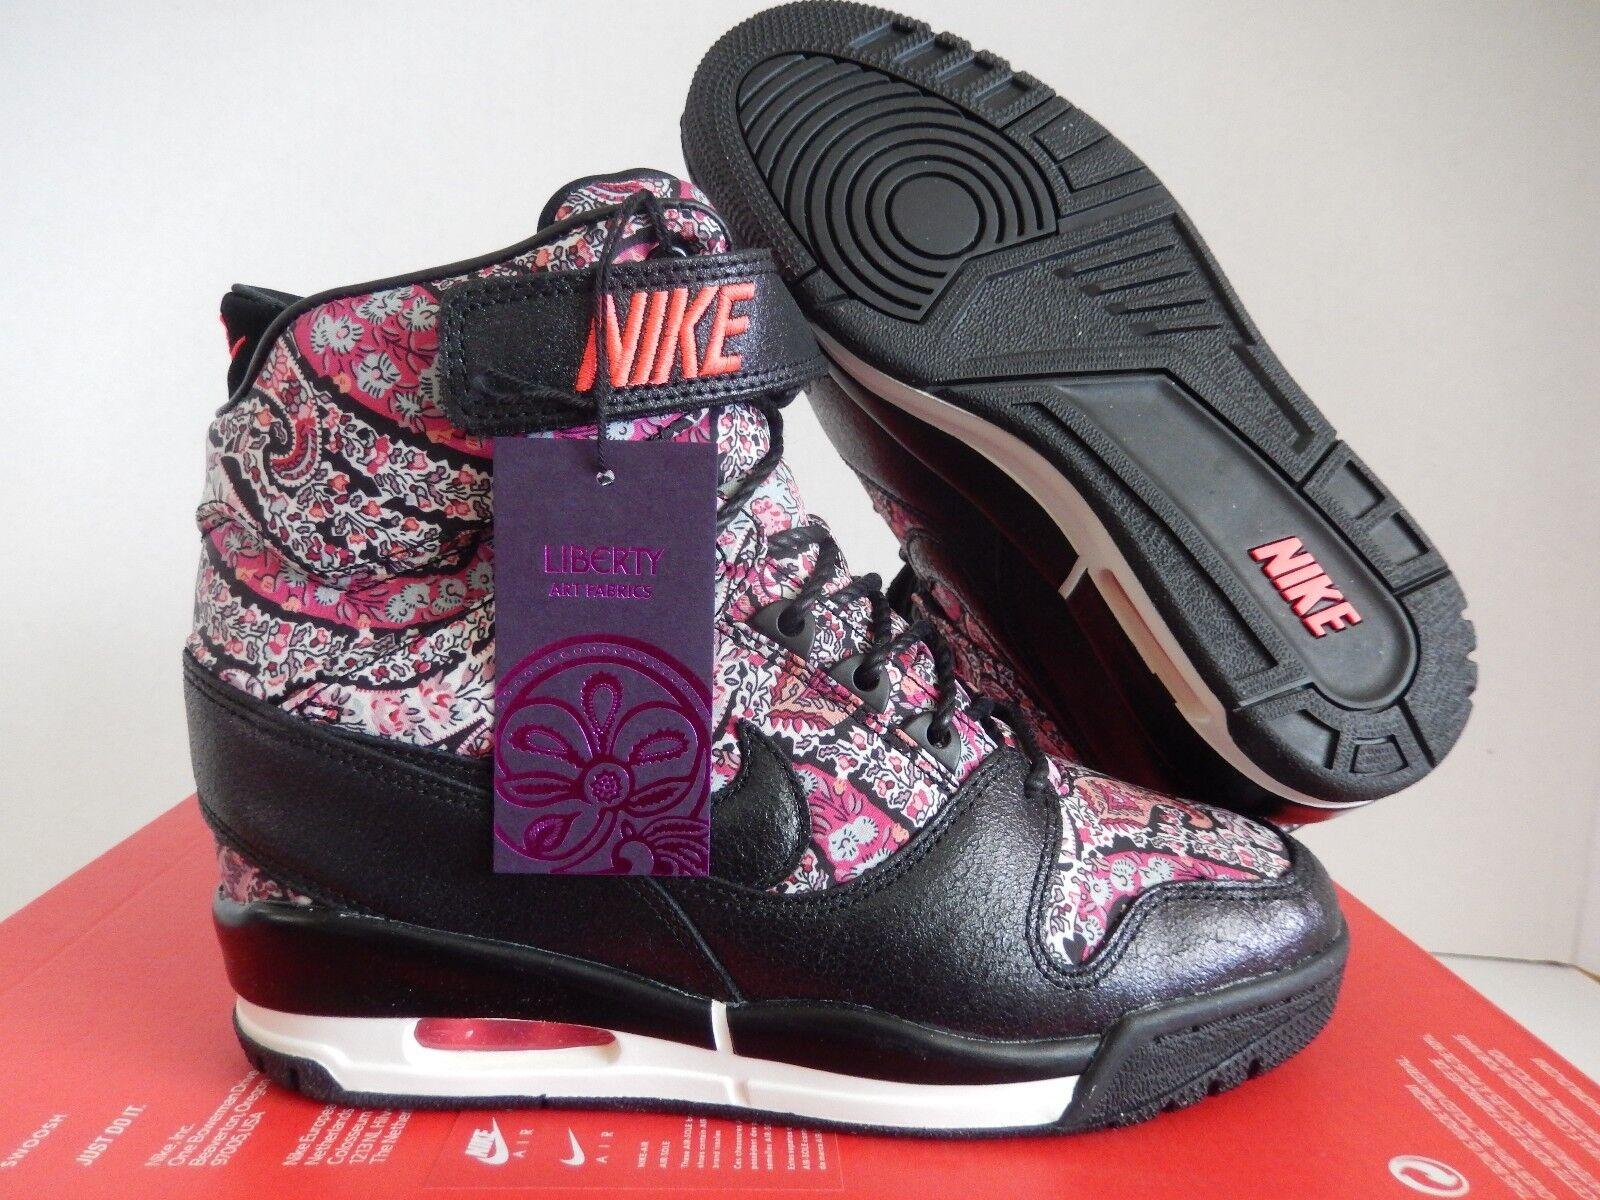 Nike air révolution Sky HI high LIB QS  LIBERTY OF LONDON  TAILLE 8